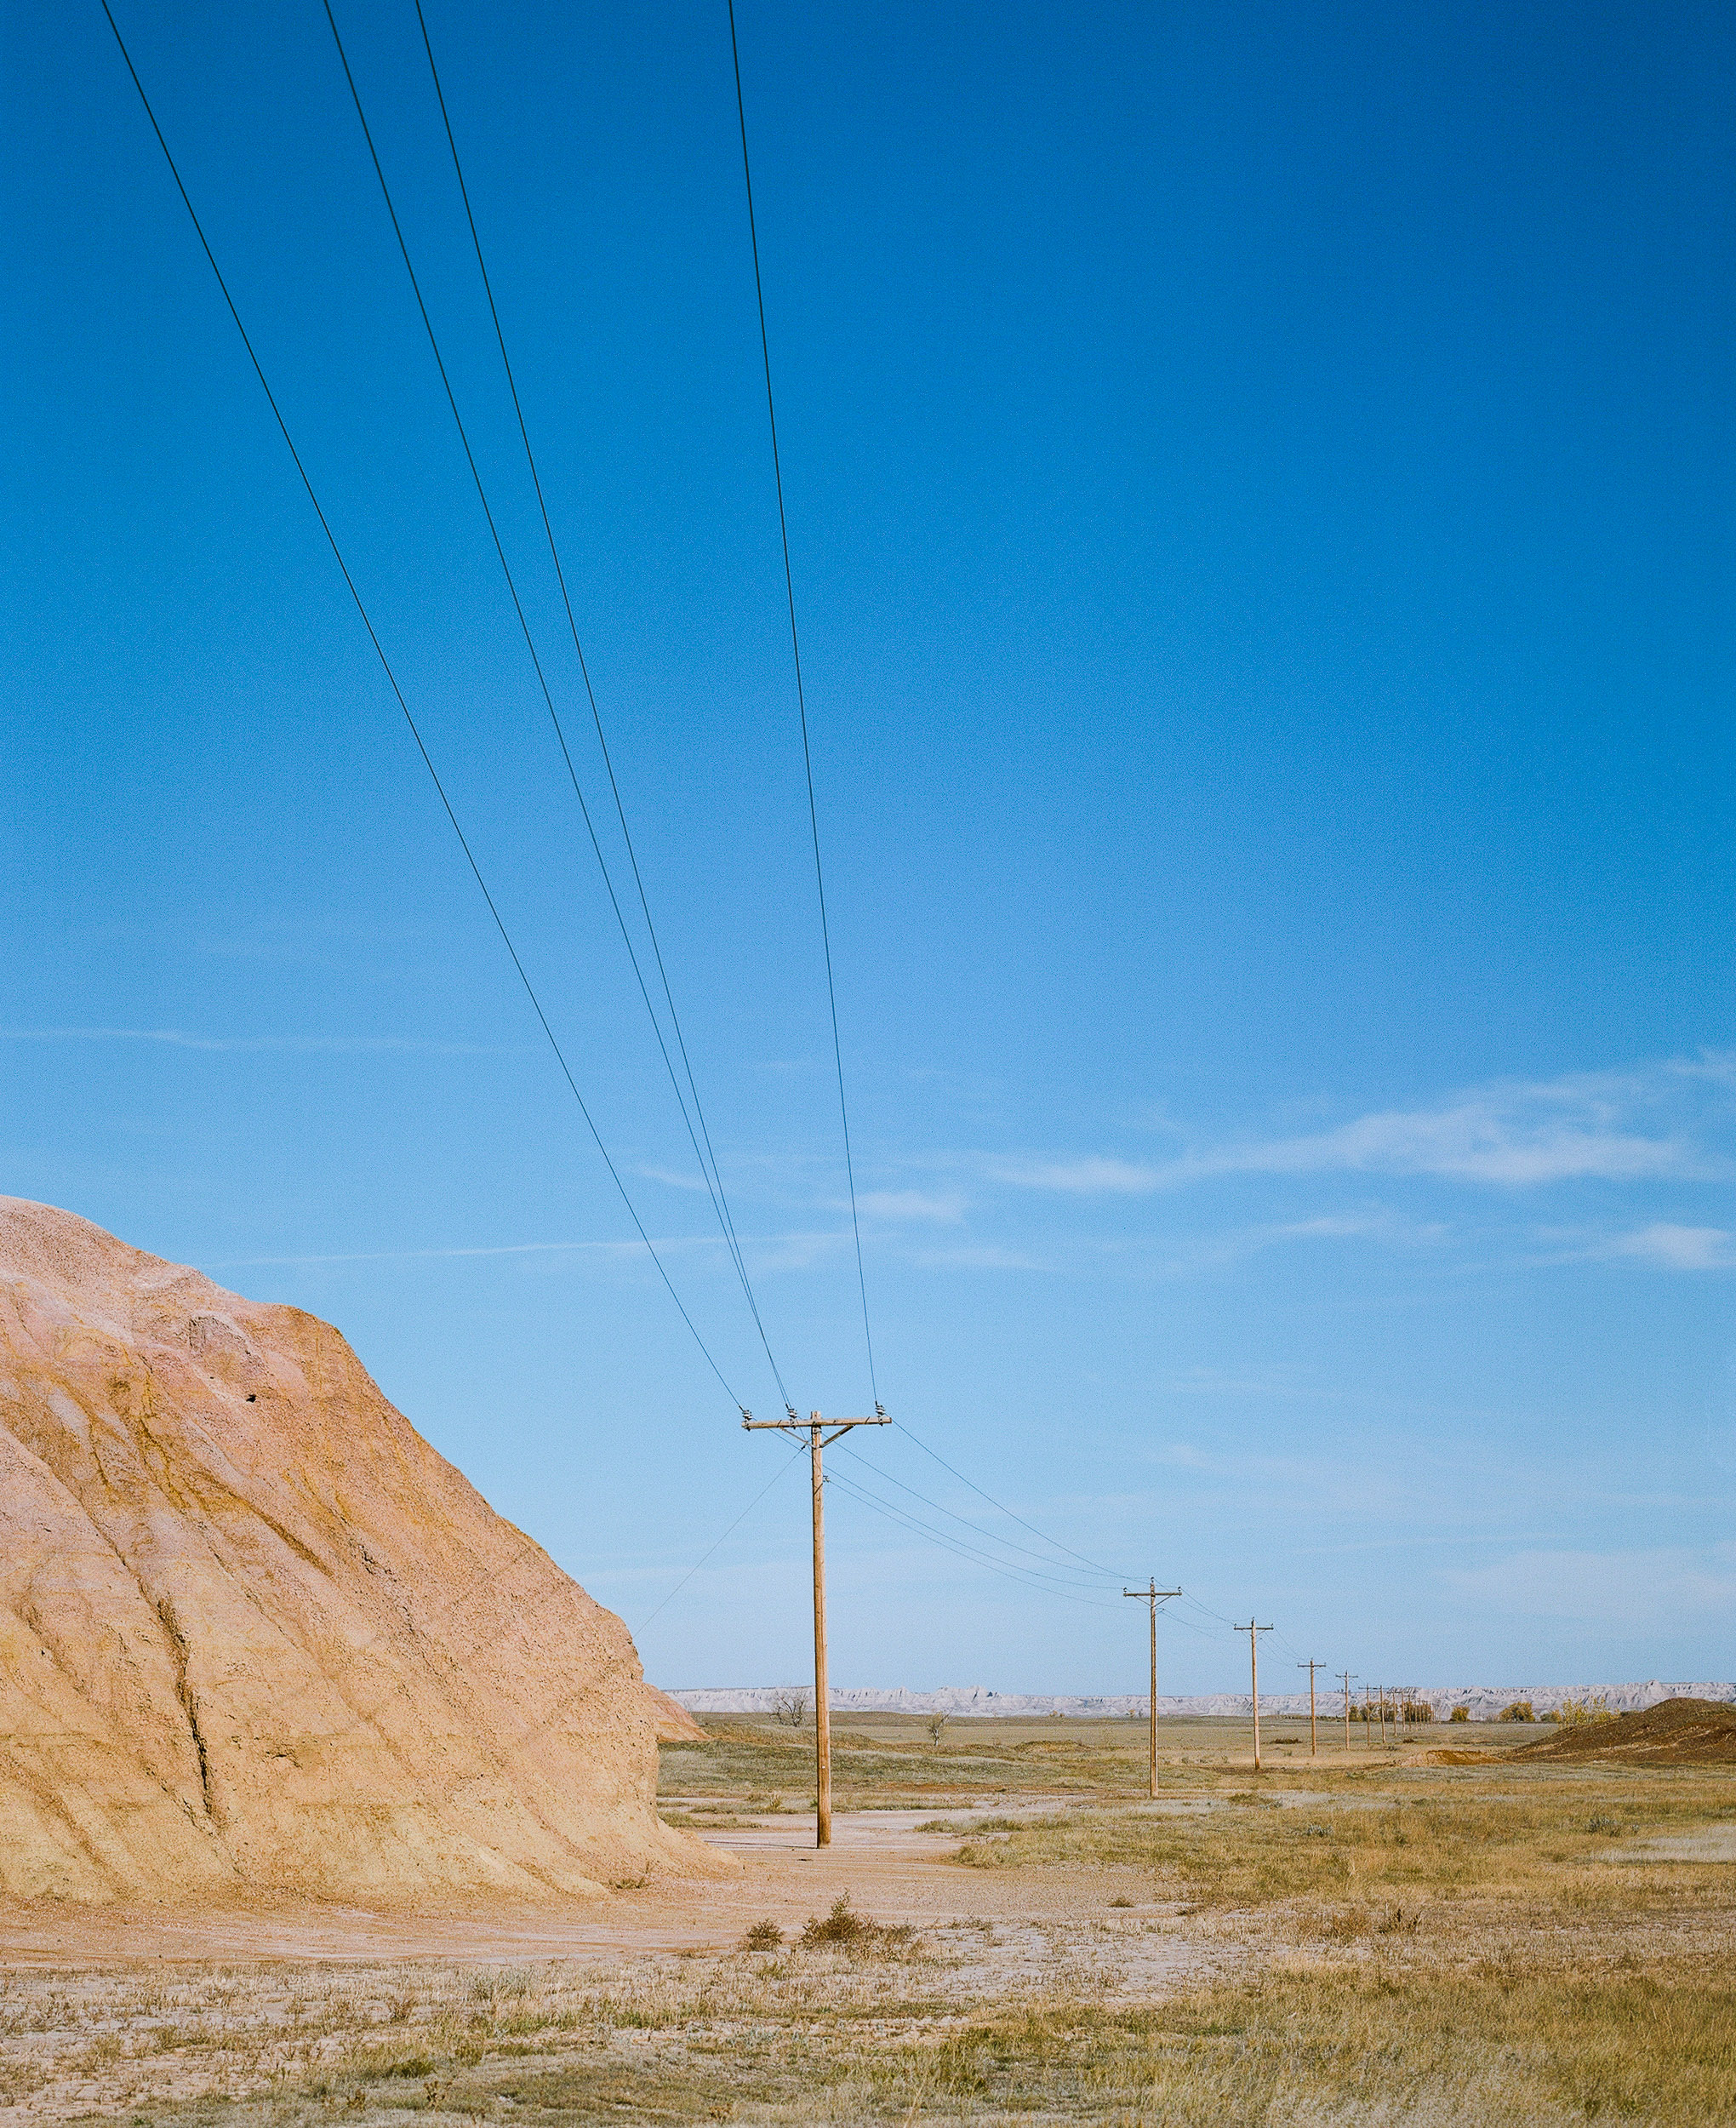 Telephone Poles through the Badlands South Dakota